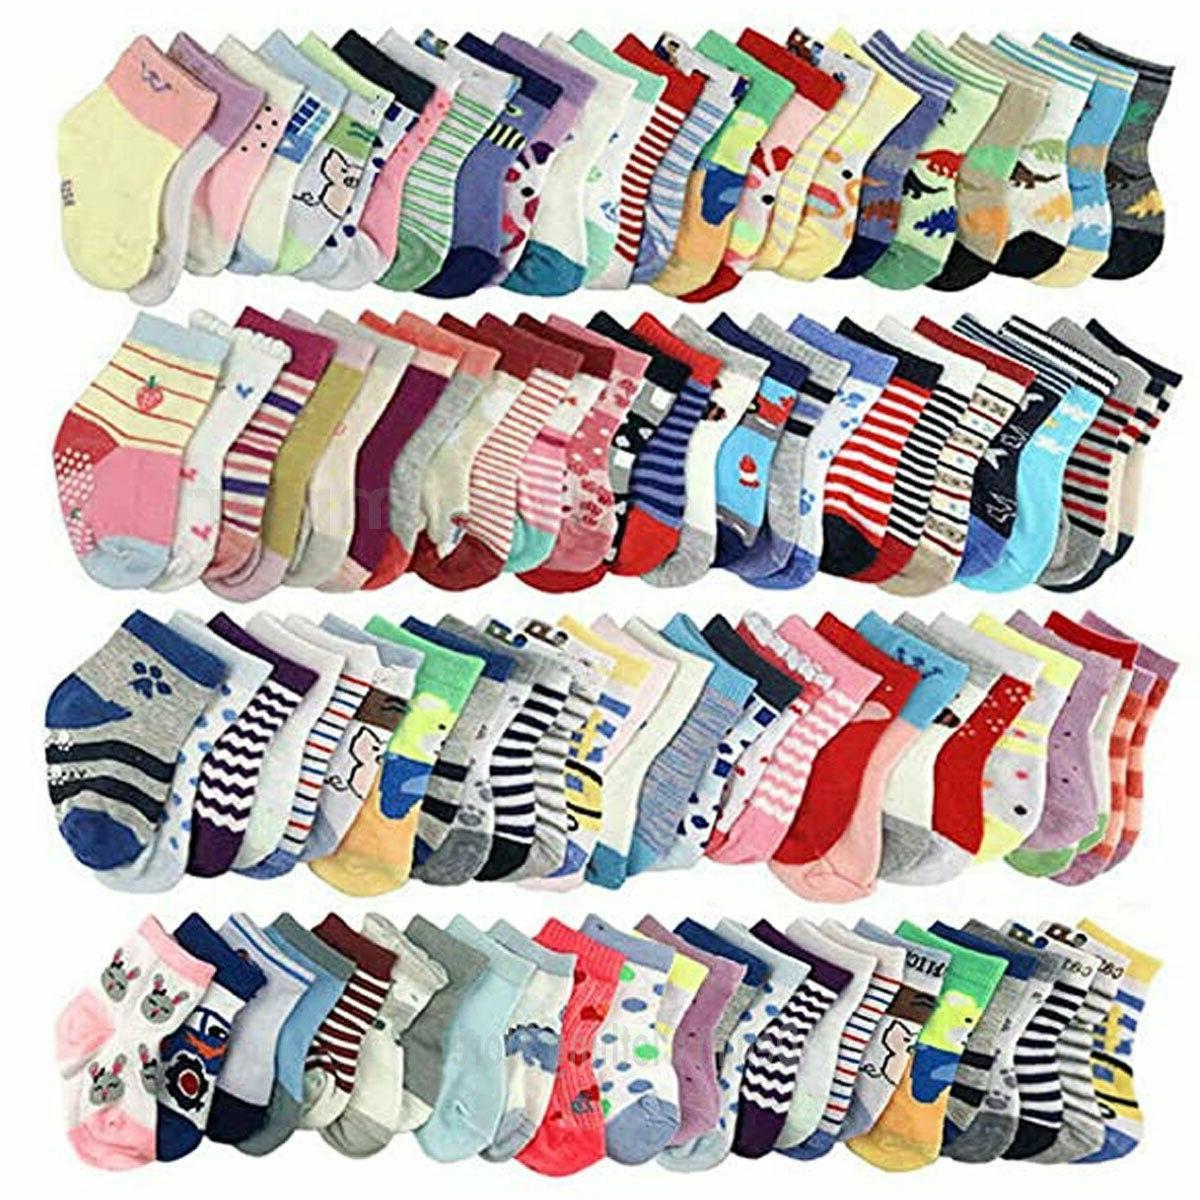 24 120 baby girl newborn socks ankle